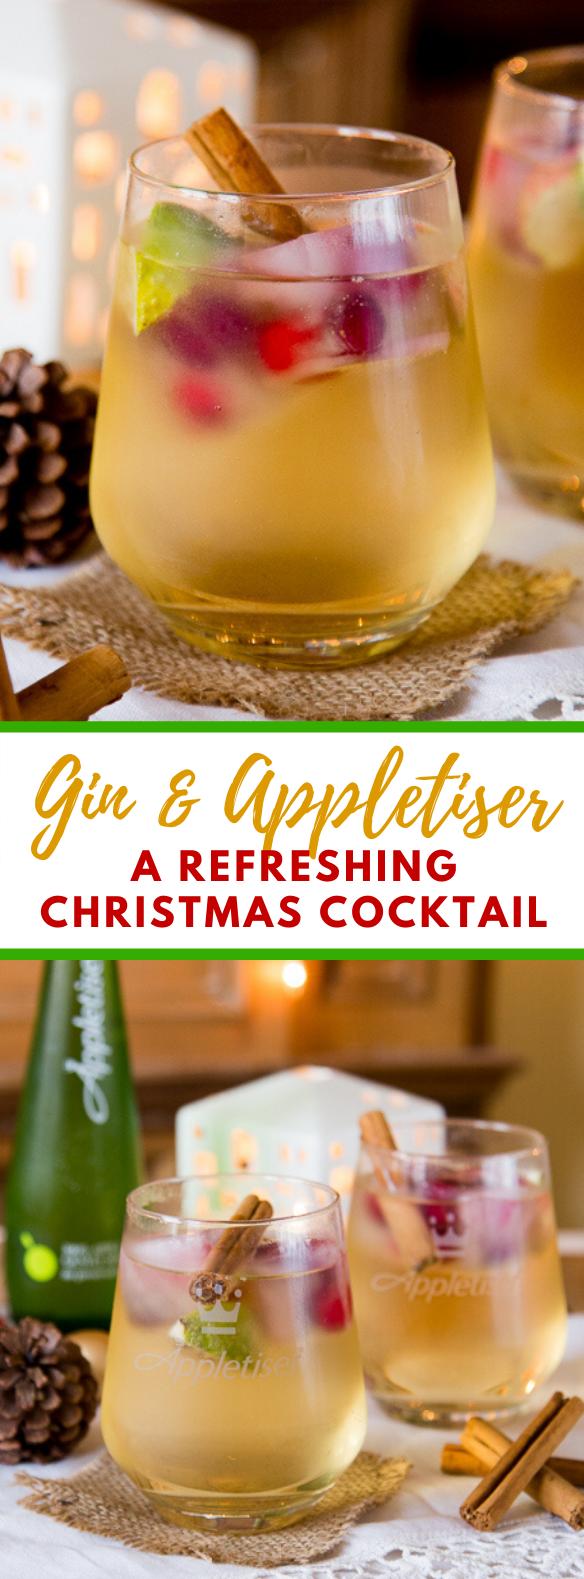 GIN & APPLETISER – A REFRESHING CHRISTMAS COCKTAIL #drinks #glutenfree